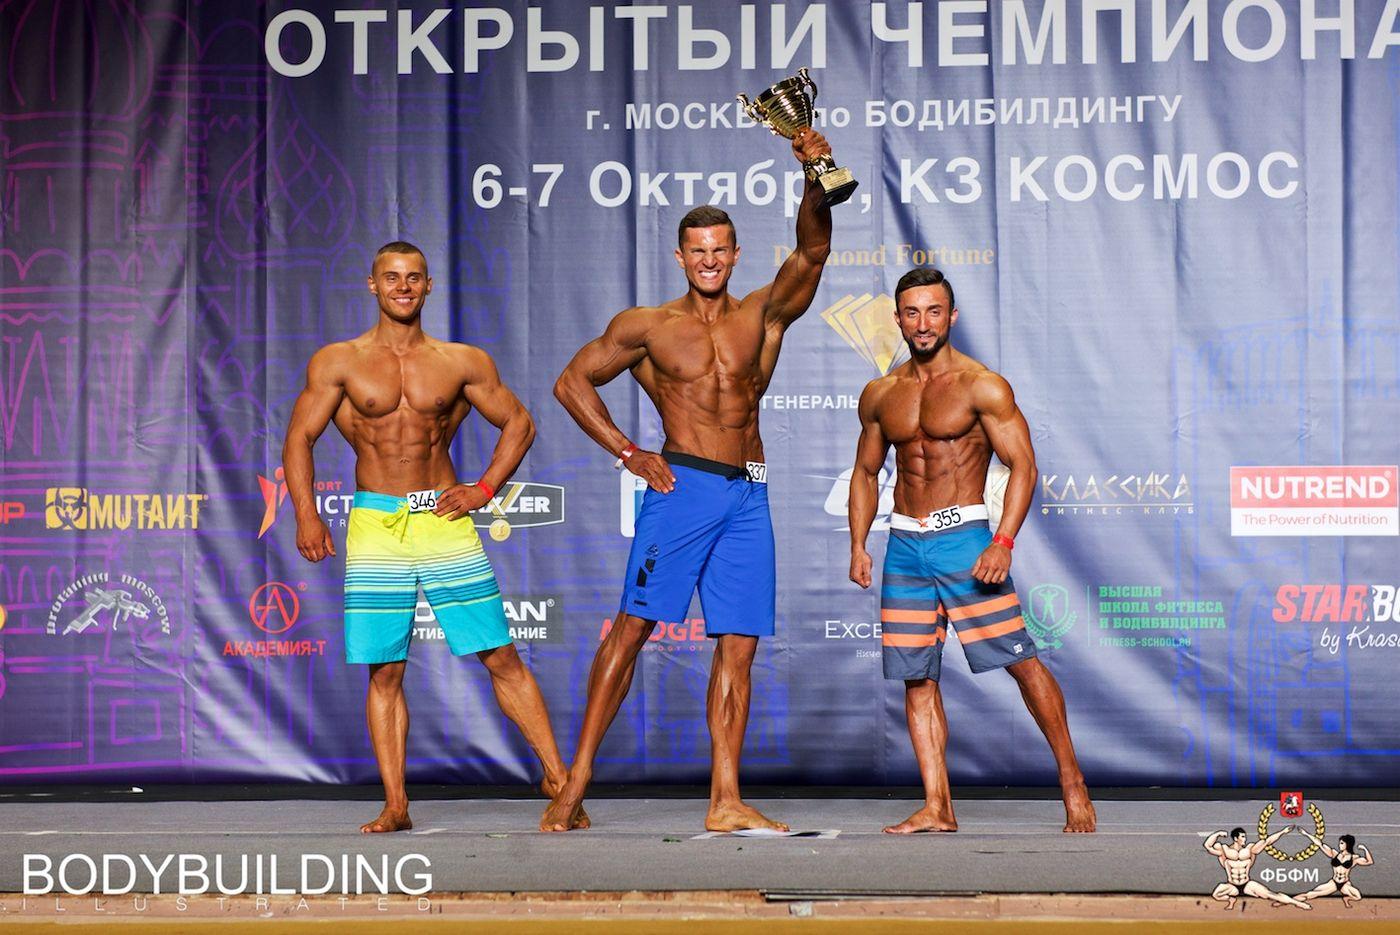 Чемпионат Москвы 2018 по бодибилдингу